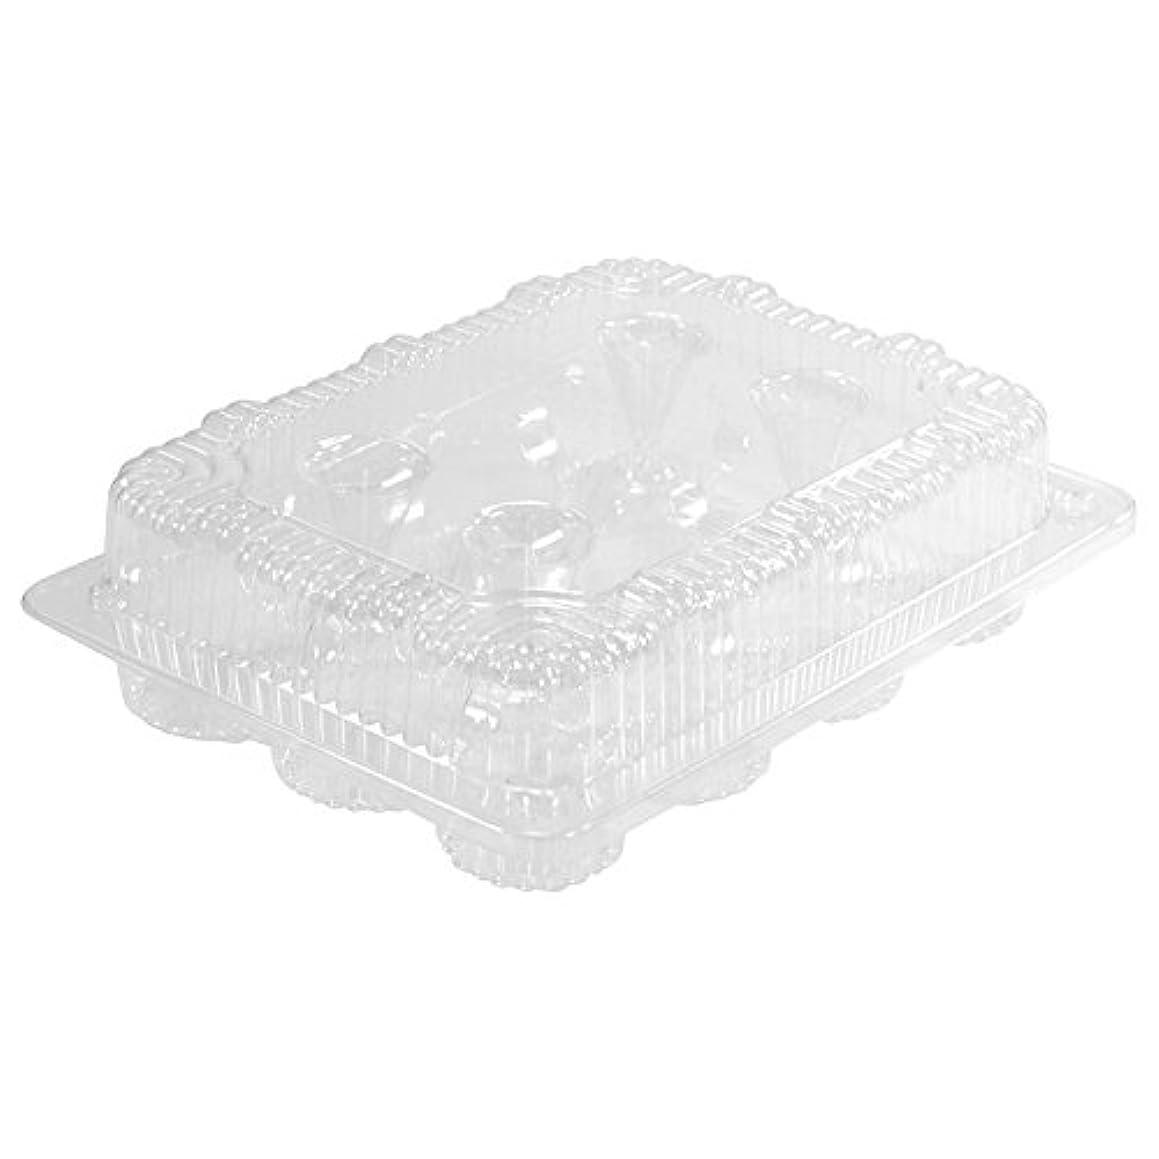 1 Dozen Mini Cupcake Container (12 cavities), 25 ct.